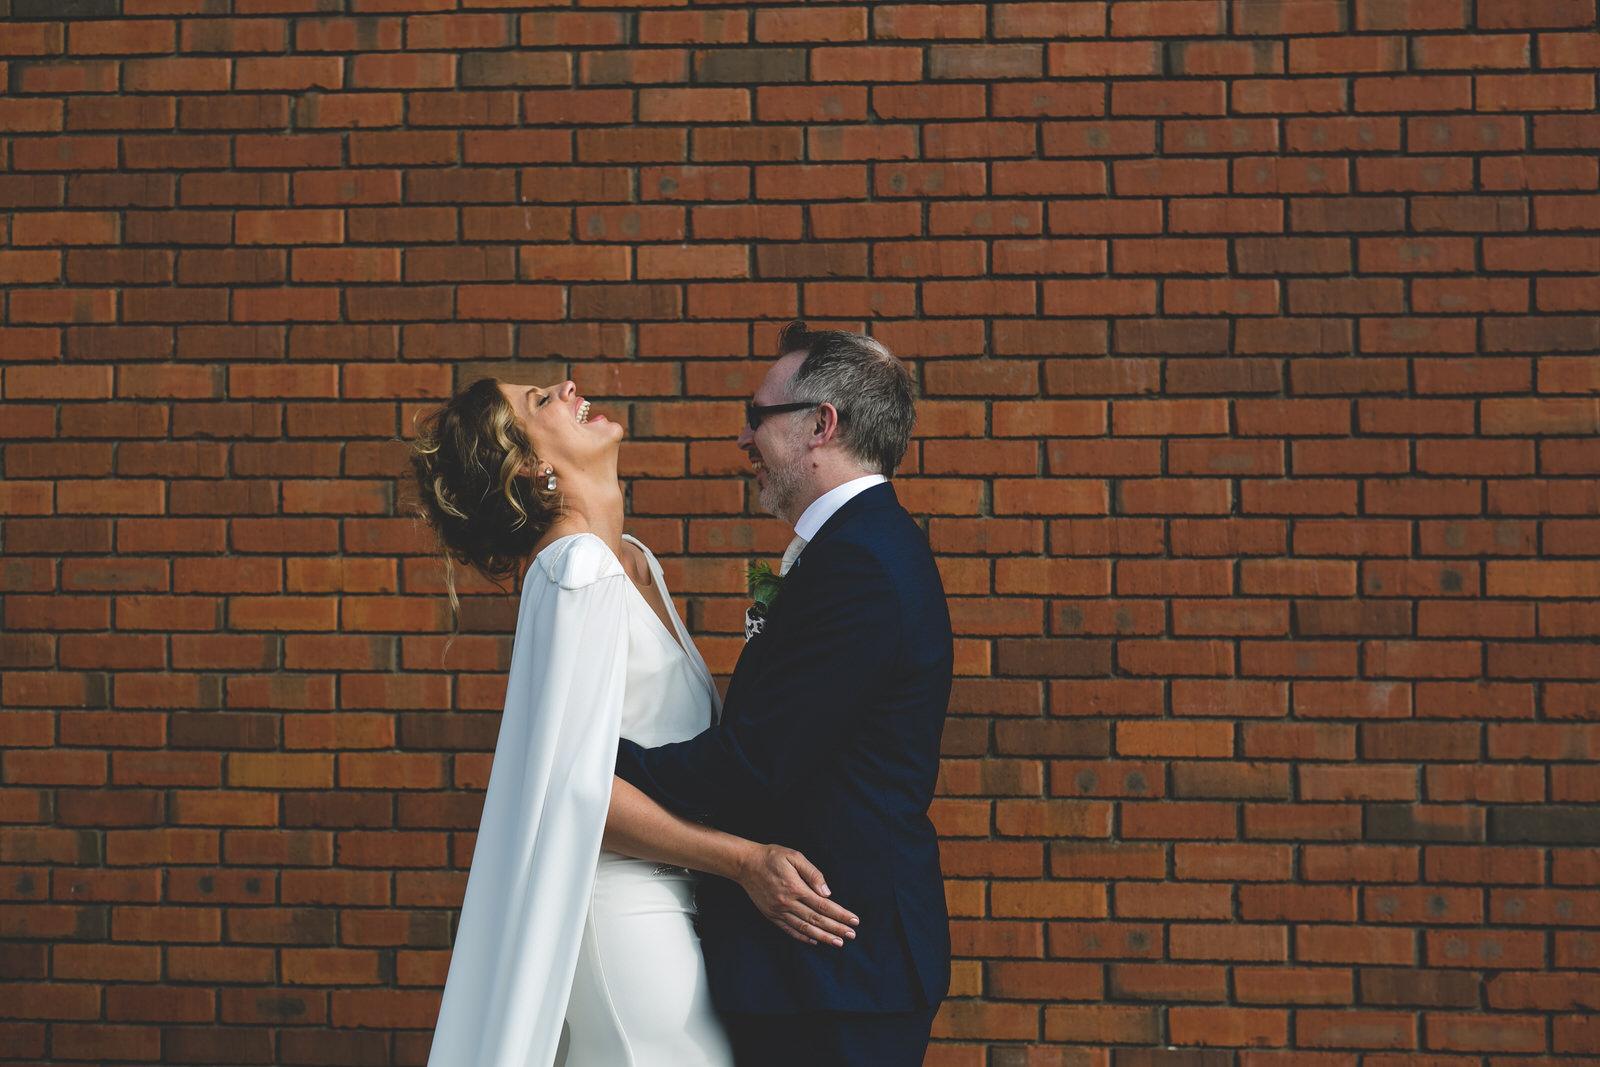 Rooftop carpark wedding portraits in Dublin